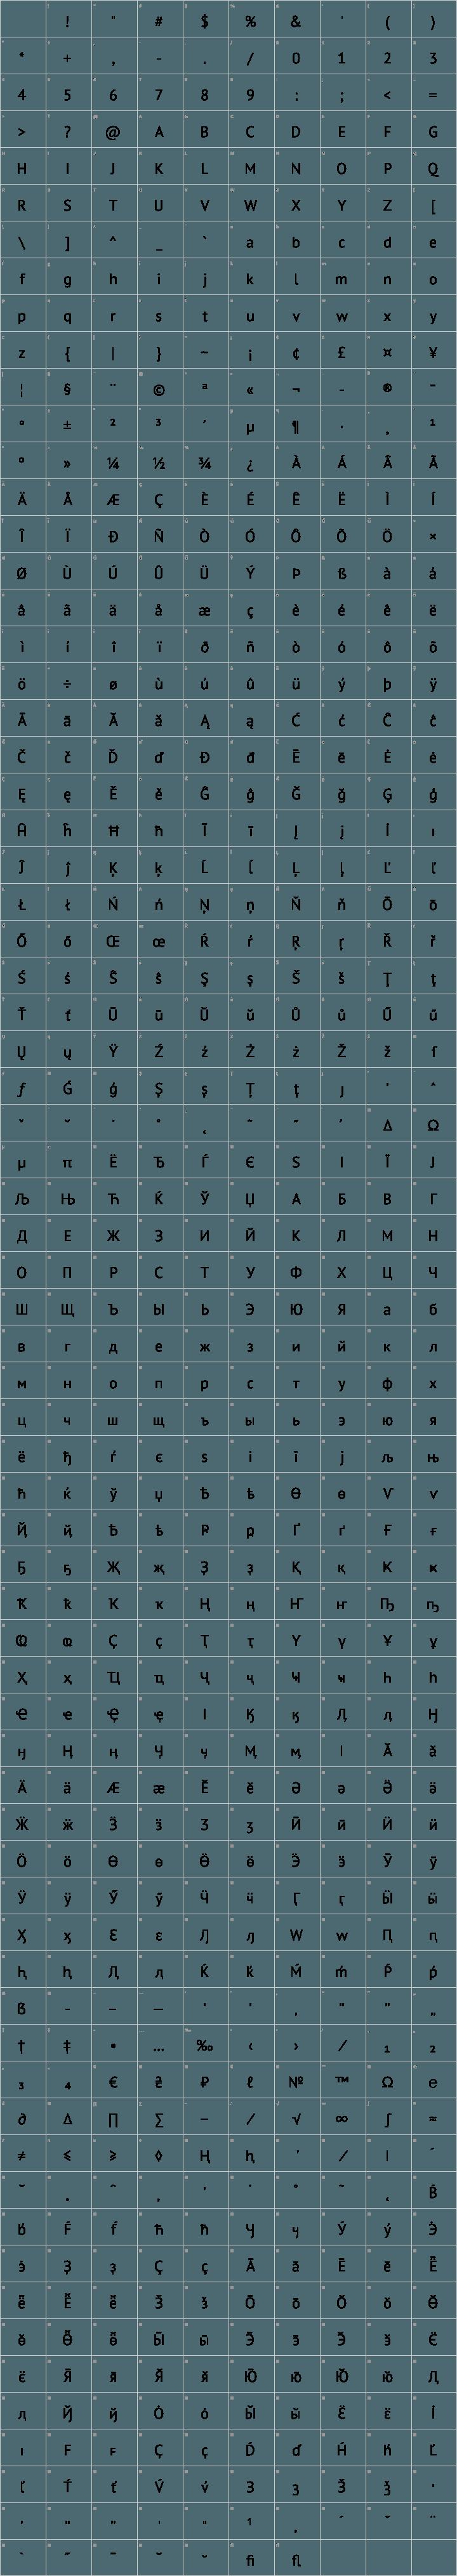 Unduh 1000 Font Adobe Caslon Pro Bold bold western Javascript